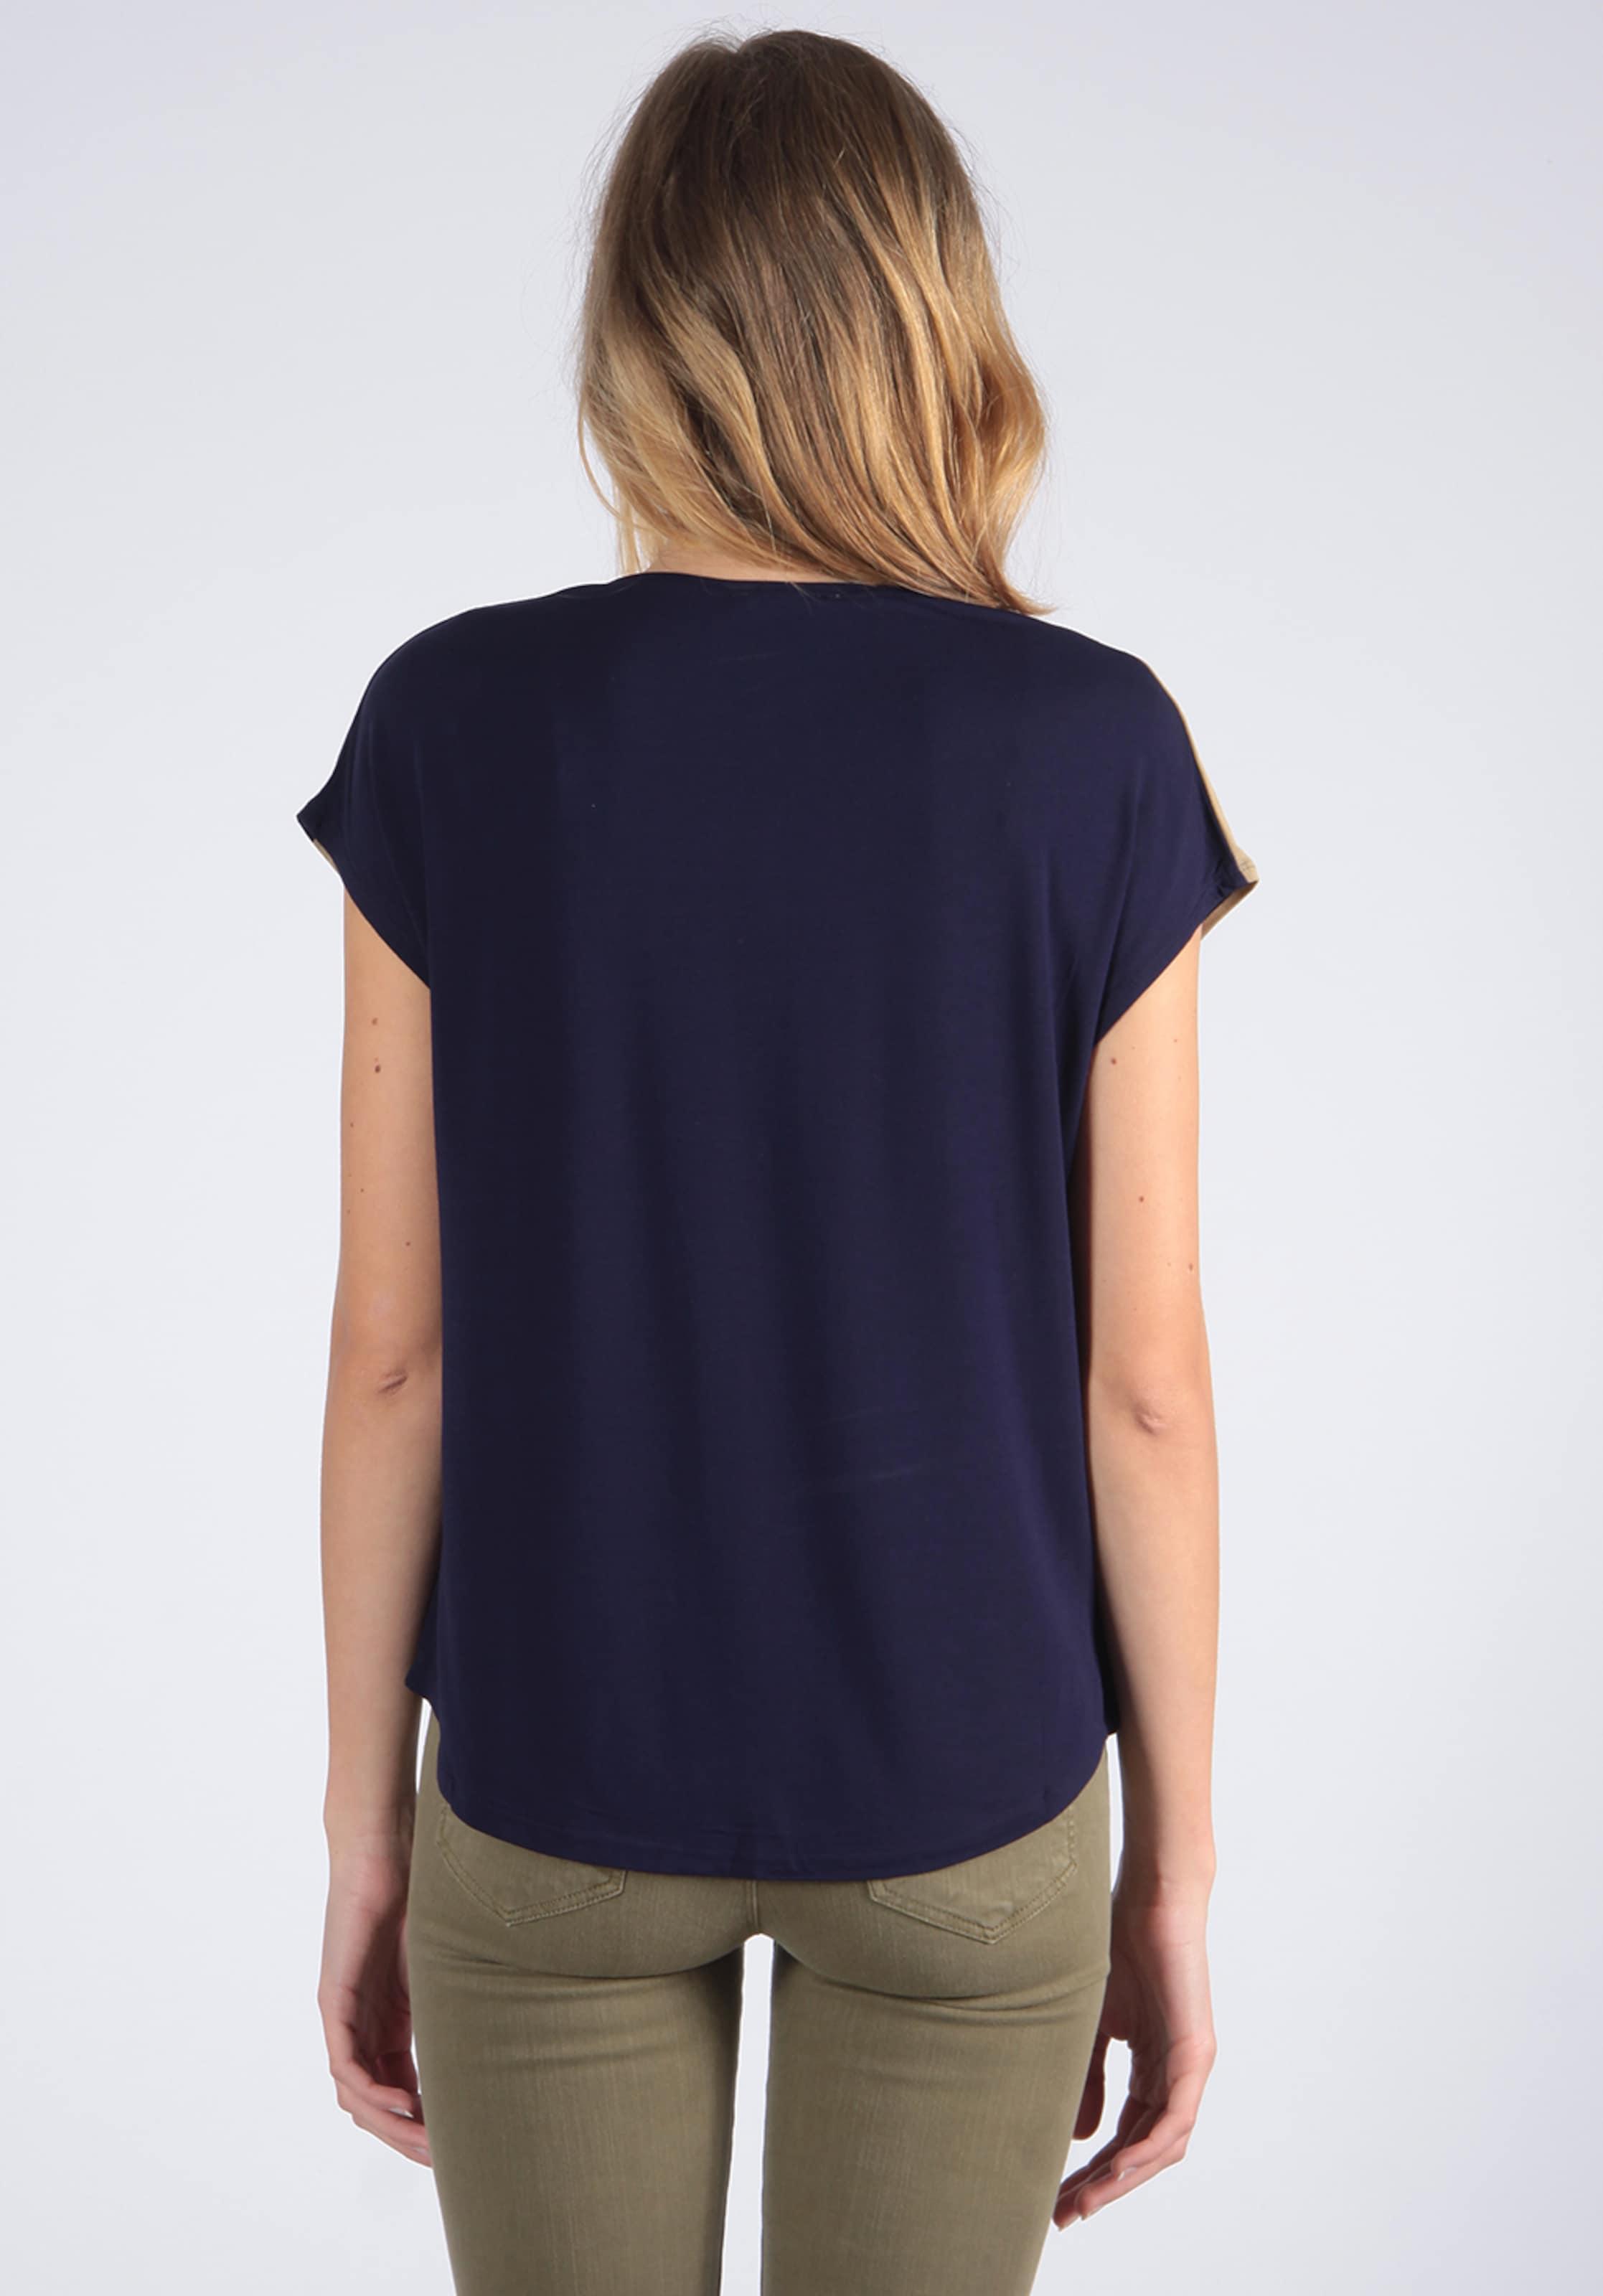 Kaporal 'bouns' Rosa Cranberry shirt In DunkelbeigeDunkelblau T dCorWxBe